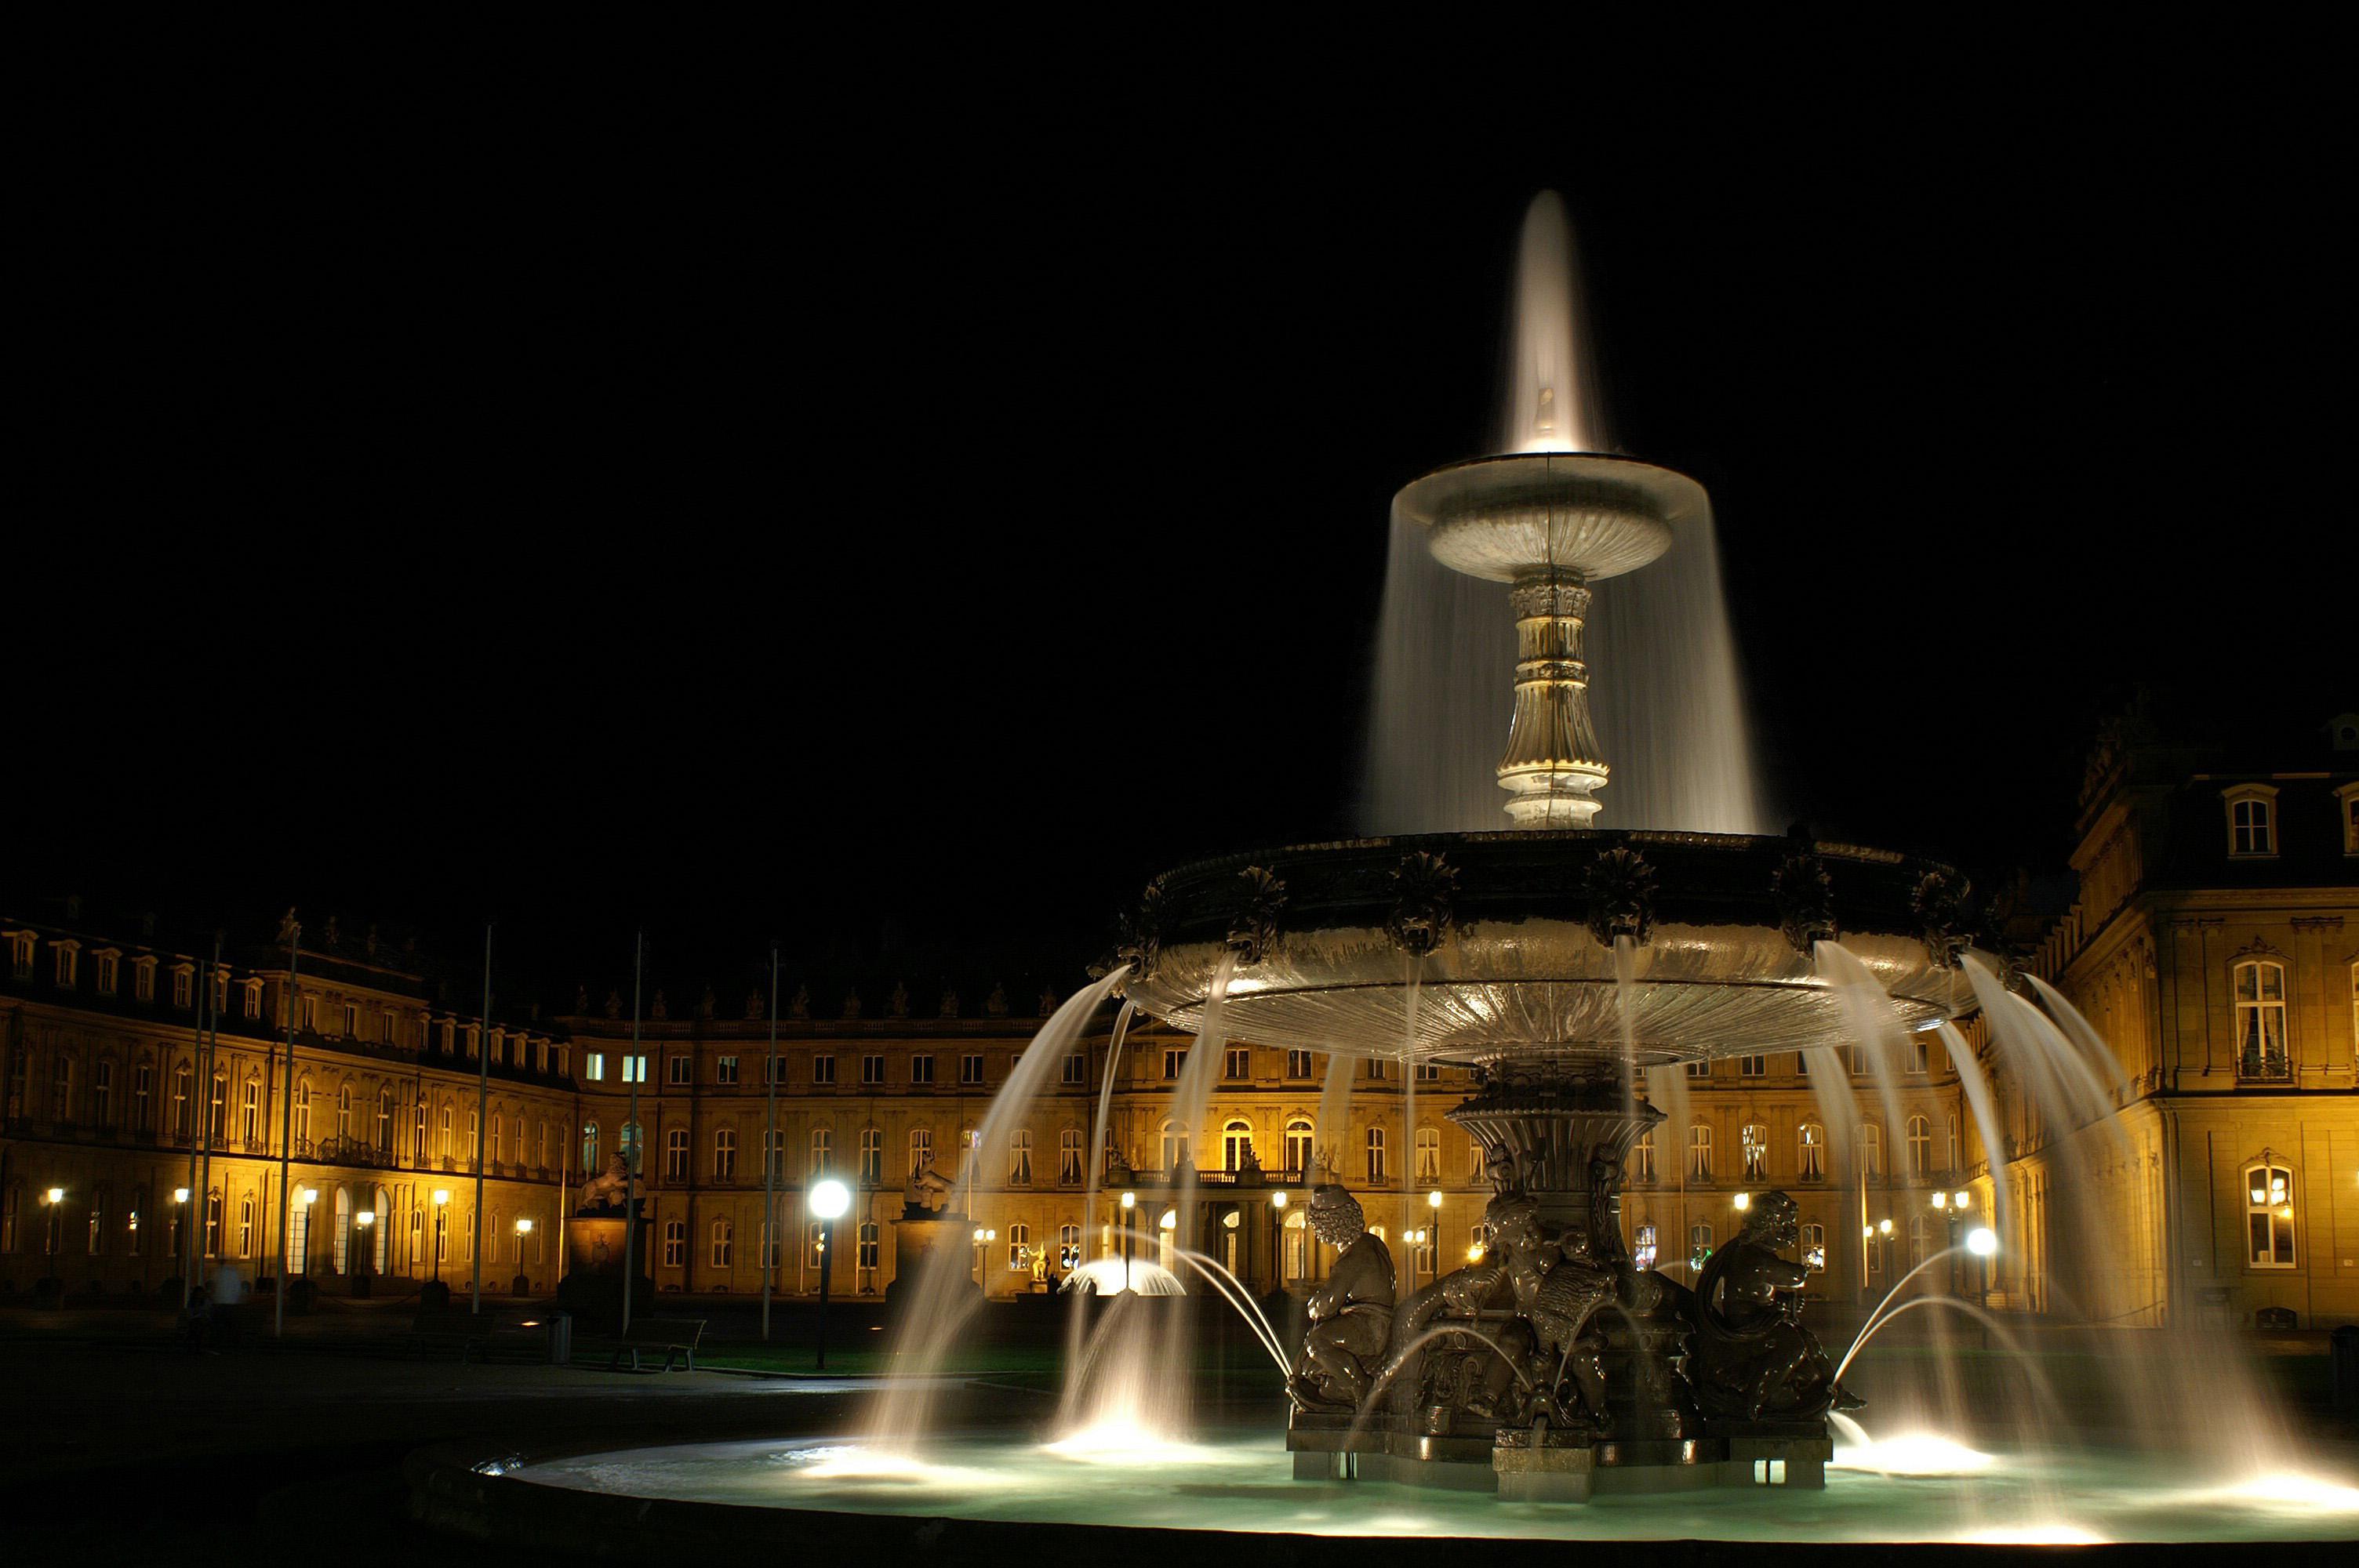 File:Stuttgart Schlossplatz Nacht new.jpg